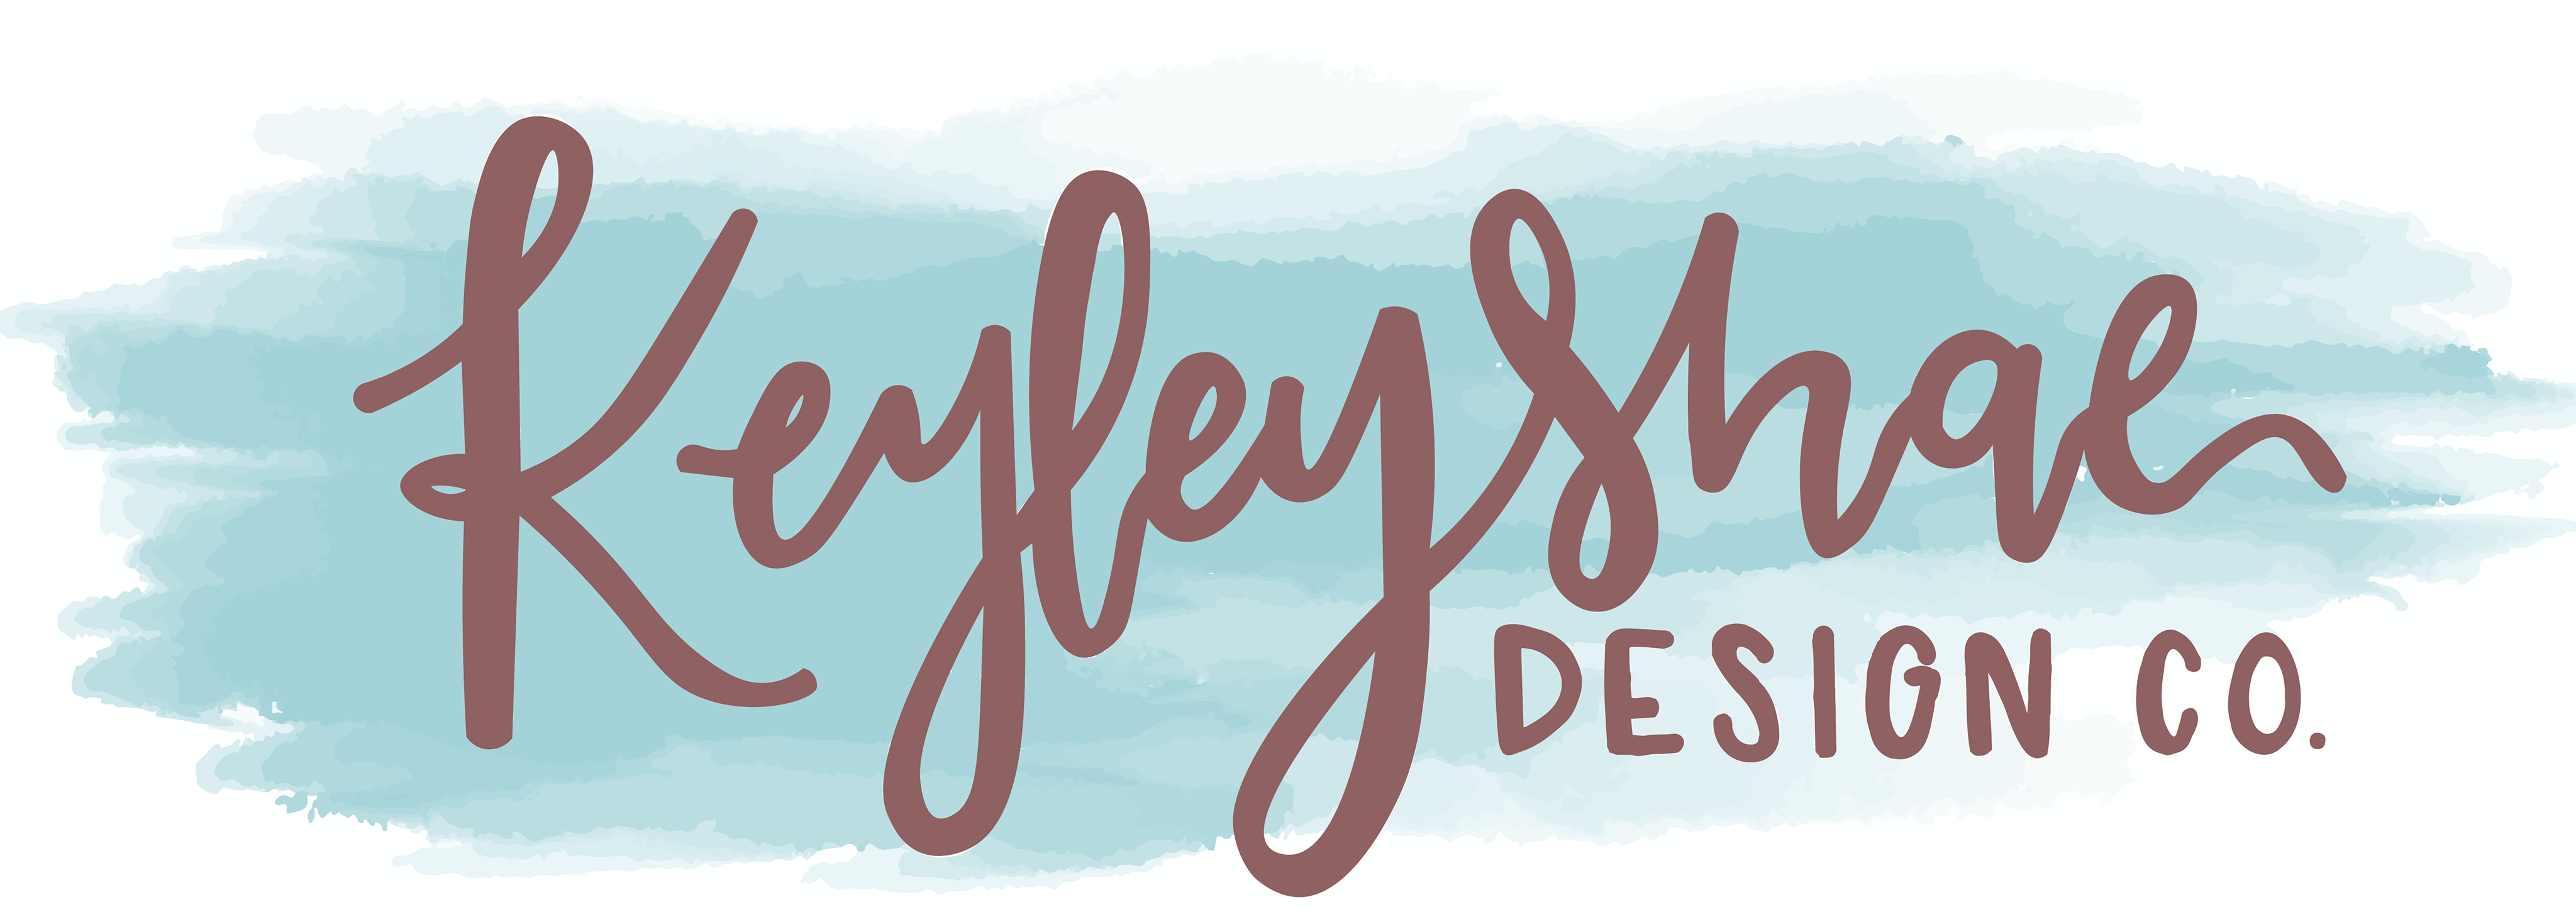 Keyley Sigmon